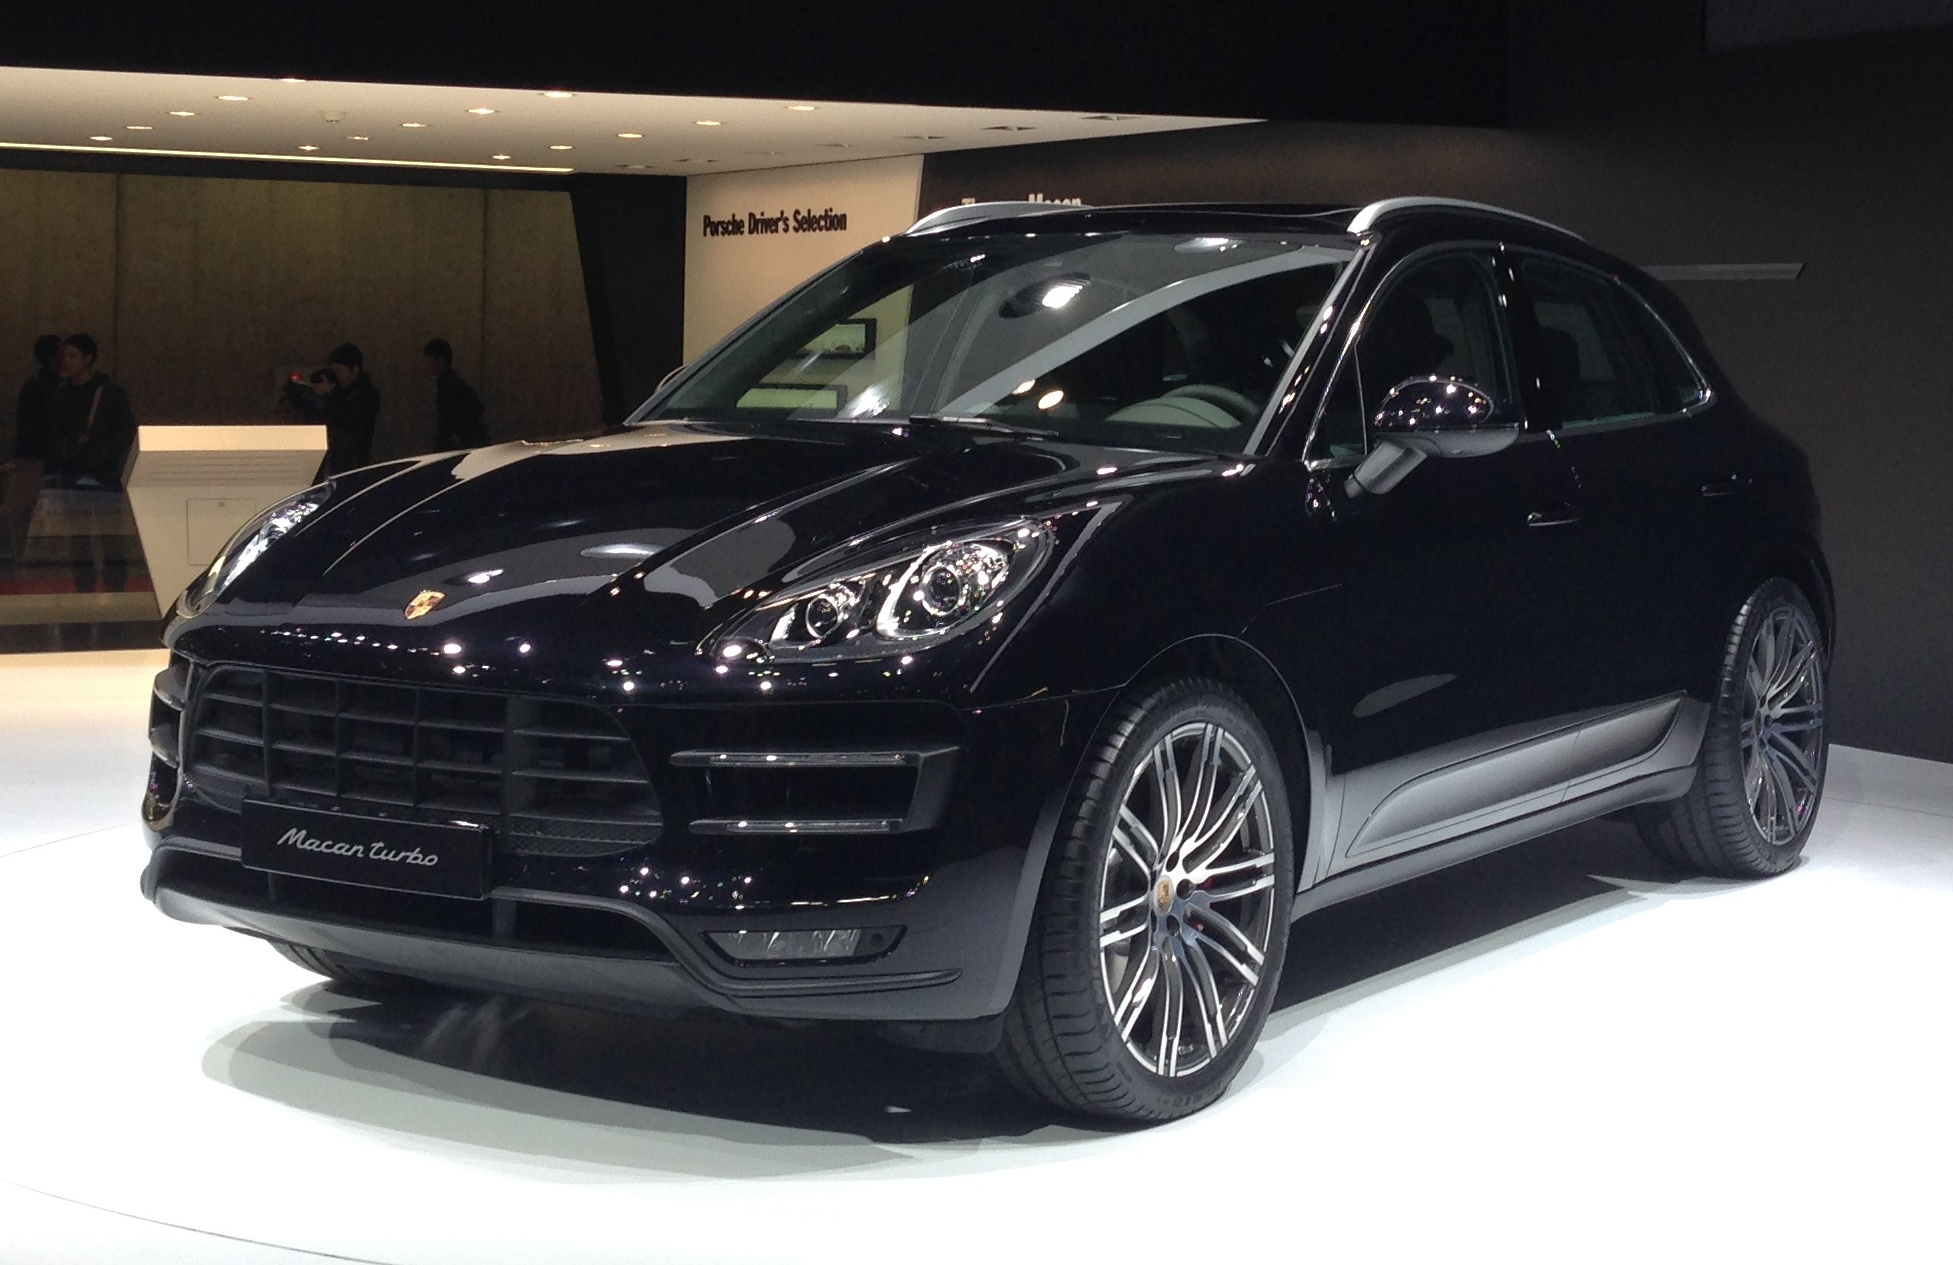 File:Porsche Macan front - Tokyo Motor Show 2013.jpg